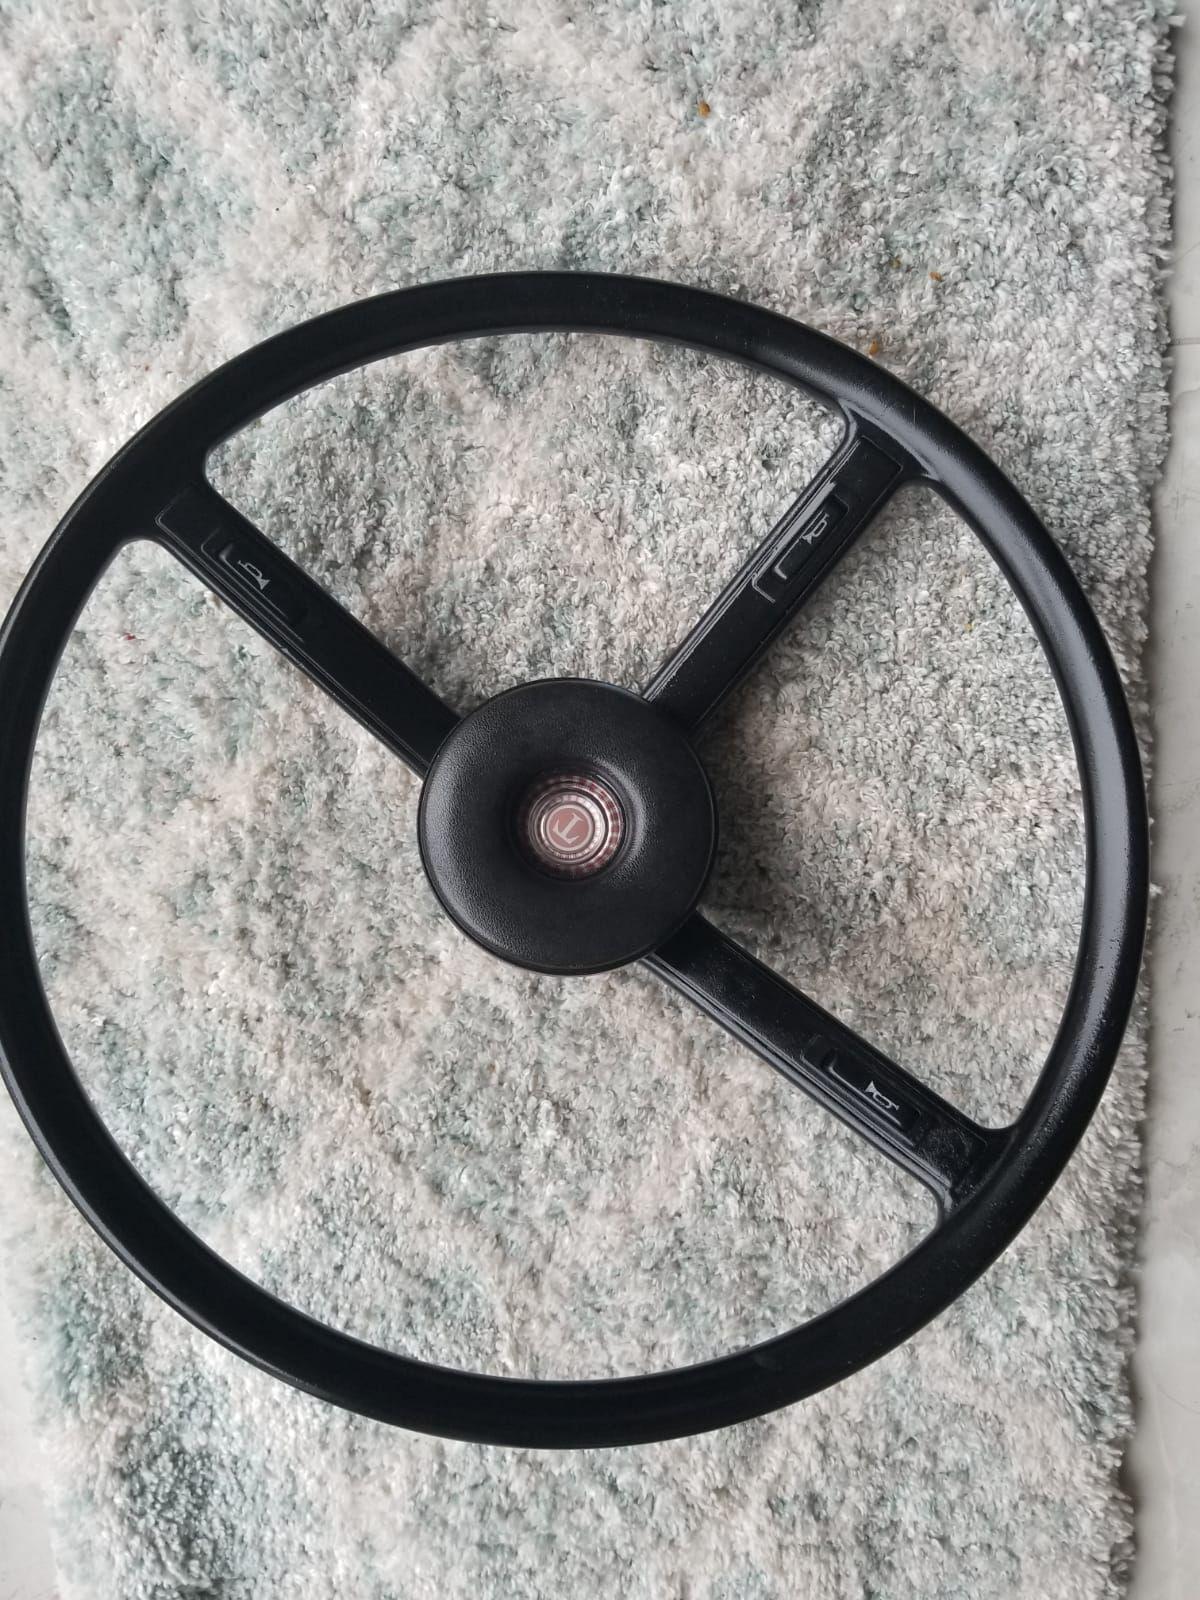 Toyota Land Cruiser Steering Wheel 9/72-7/80 FJ40 FJ43 FJ45